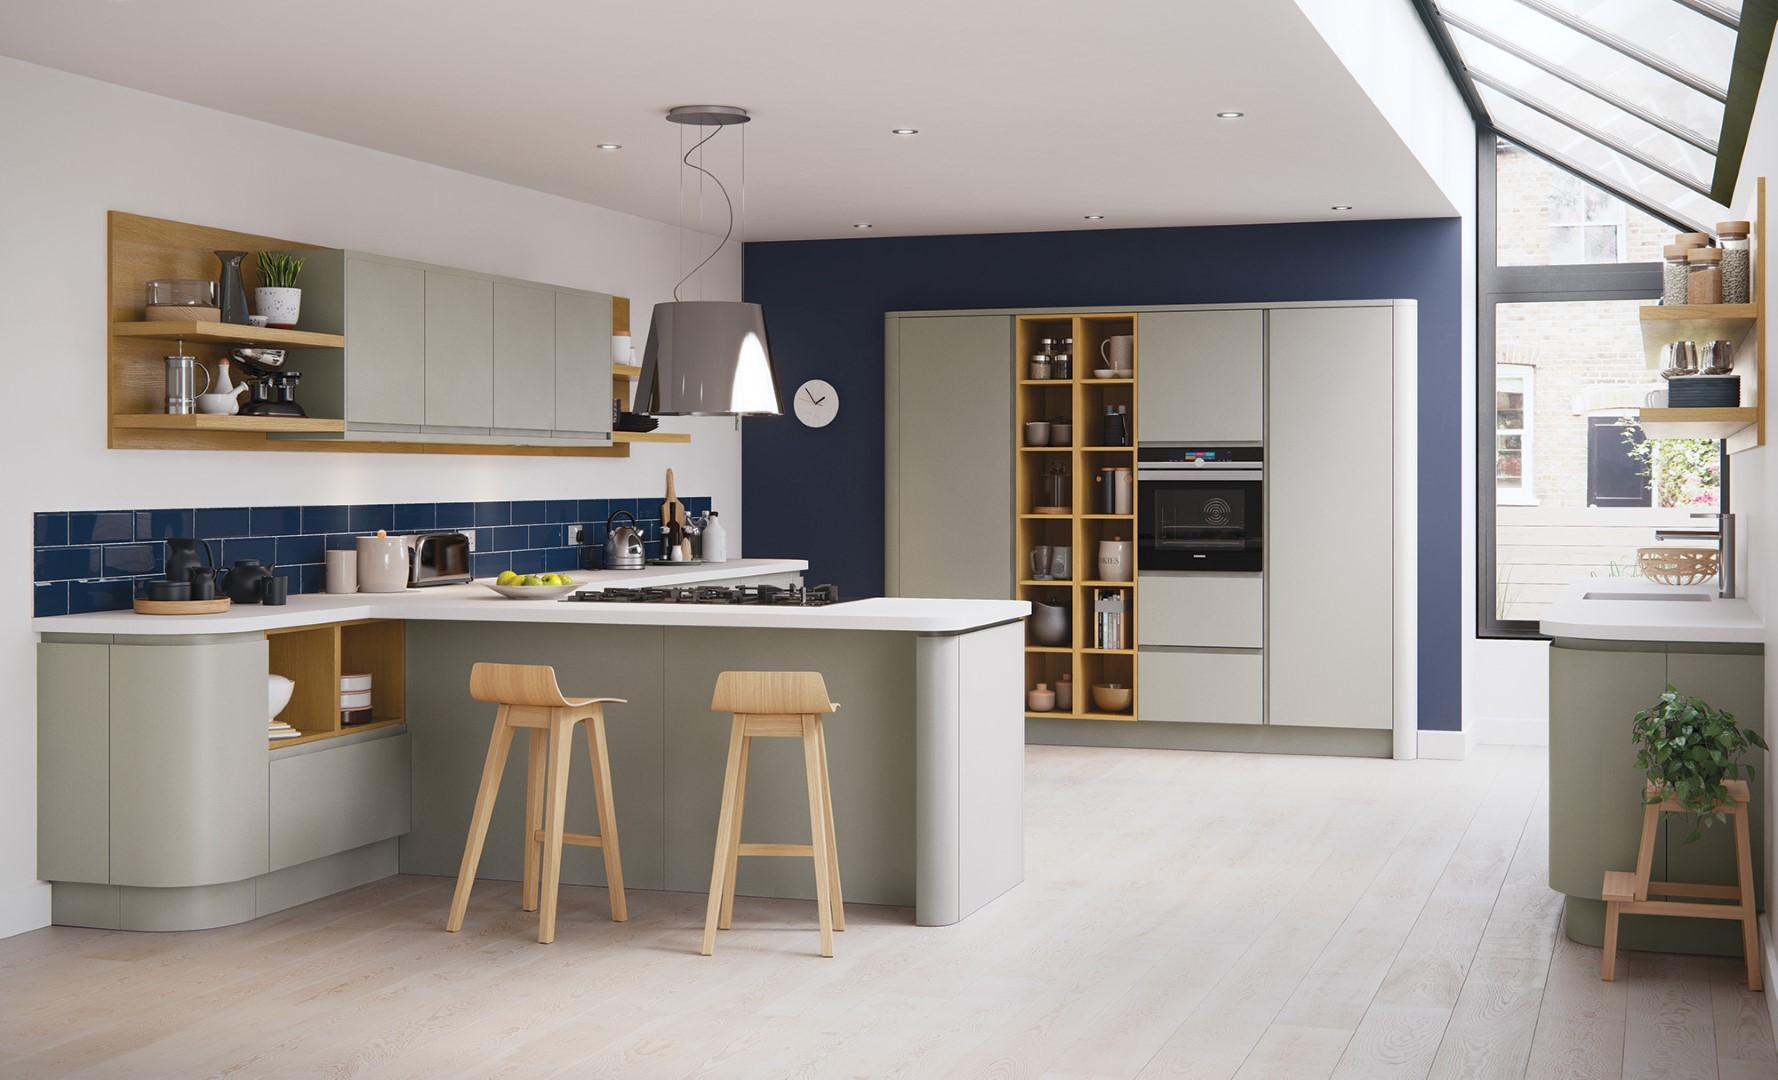 Modern Contemporary Strada Matte Stone Painted Kitchen - Kitchen Design - Alan Kelly Kitchens - Waterford